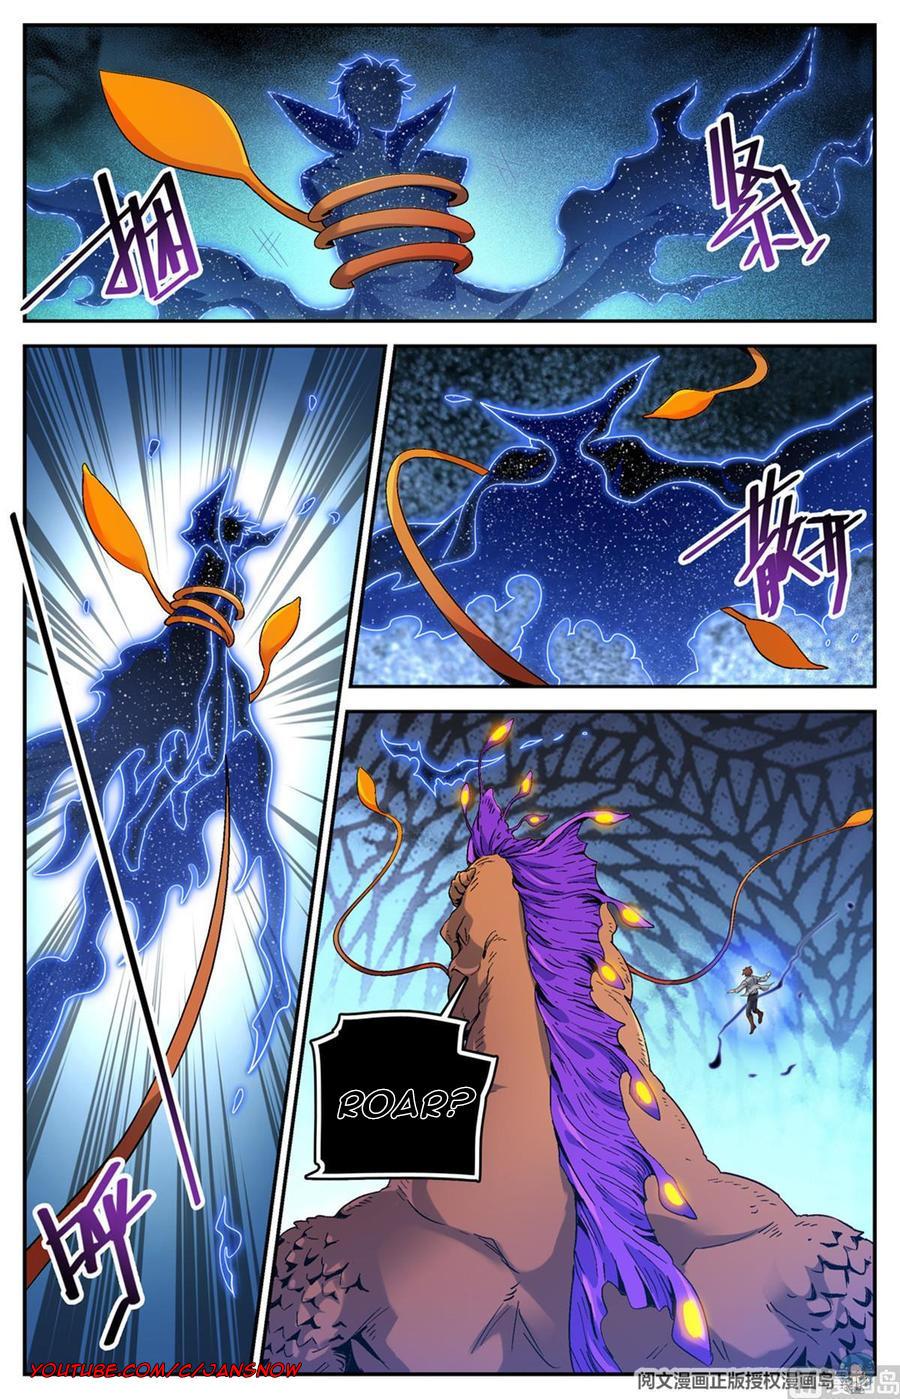 Versatile Mage Chapter 651 page 6 - Mangakakalots.com